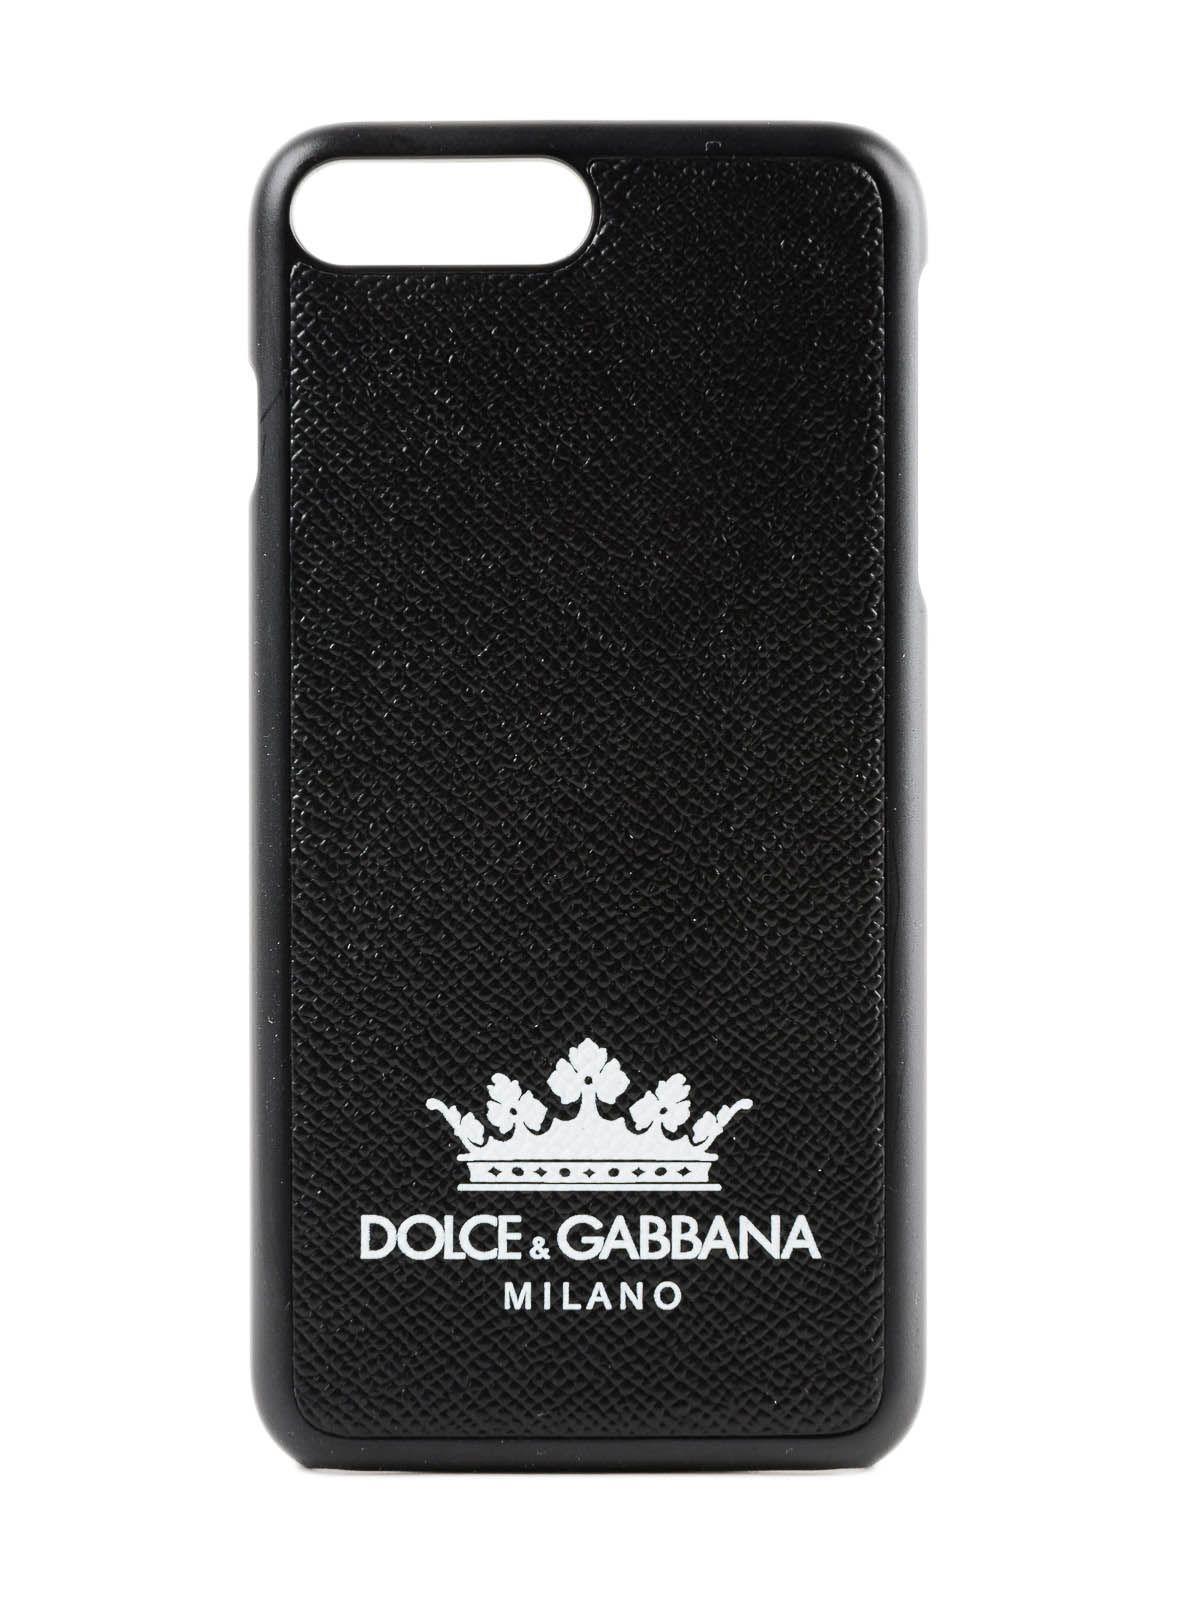 Dolce & Gabbana Dg Milano Iphone 7 Plus Case